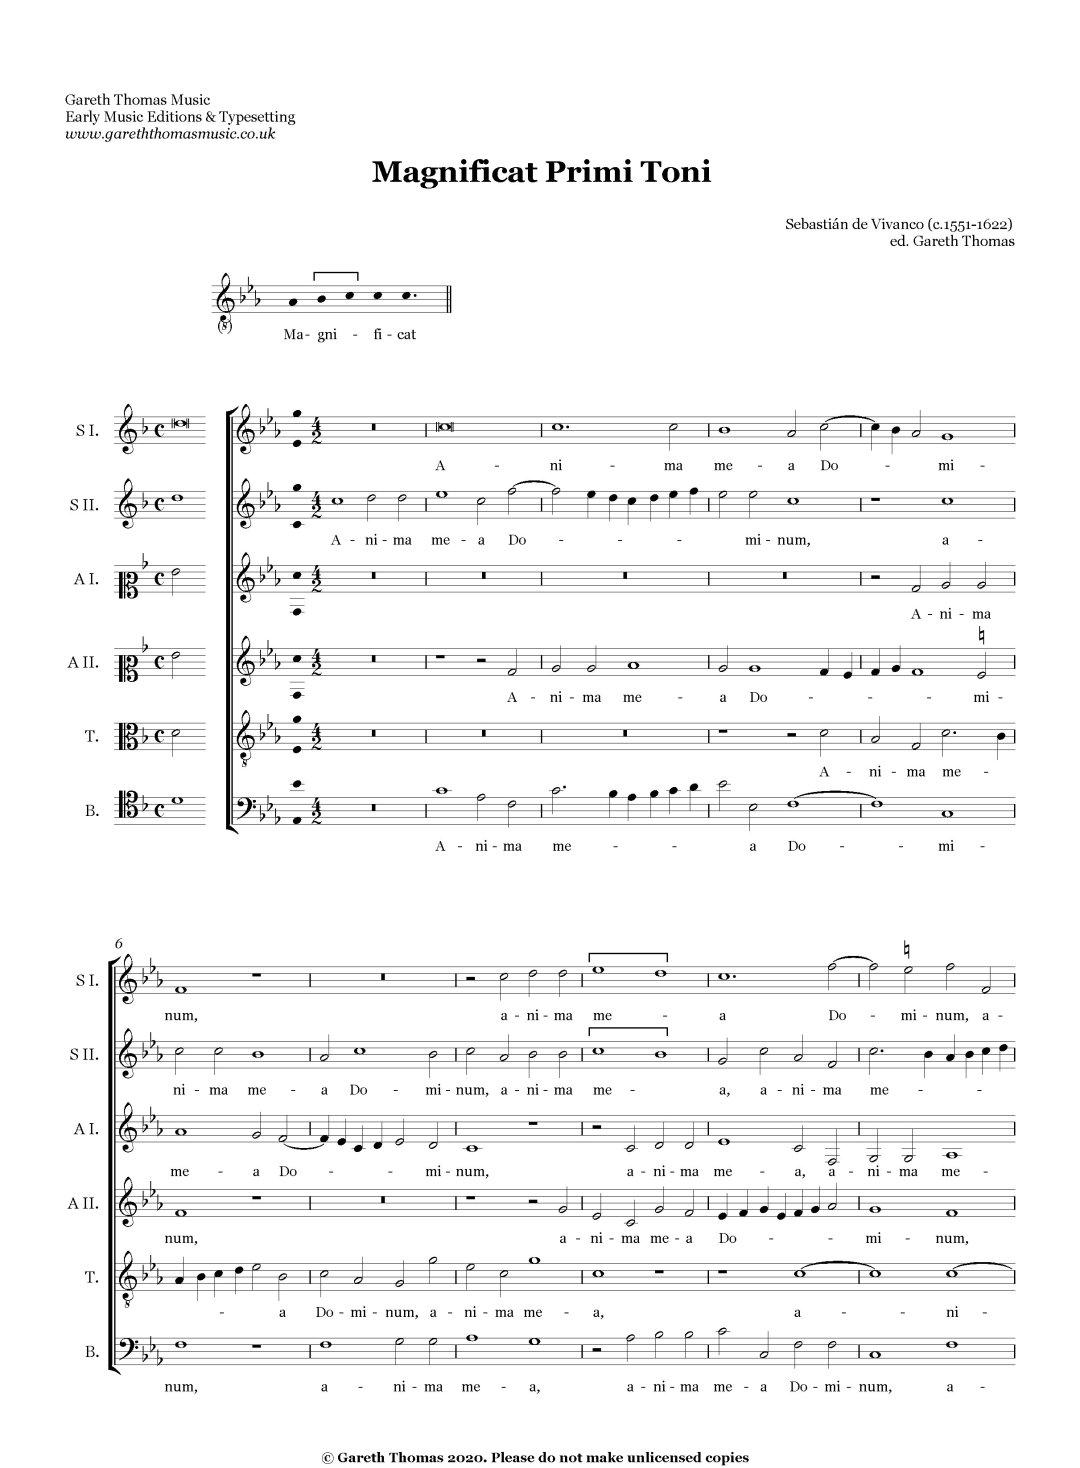 Sebastián de Vivanco Magnificat Primi toni a6 image